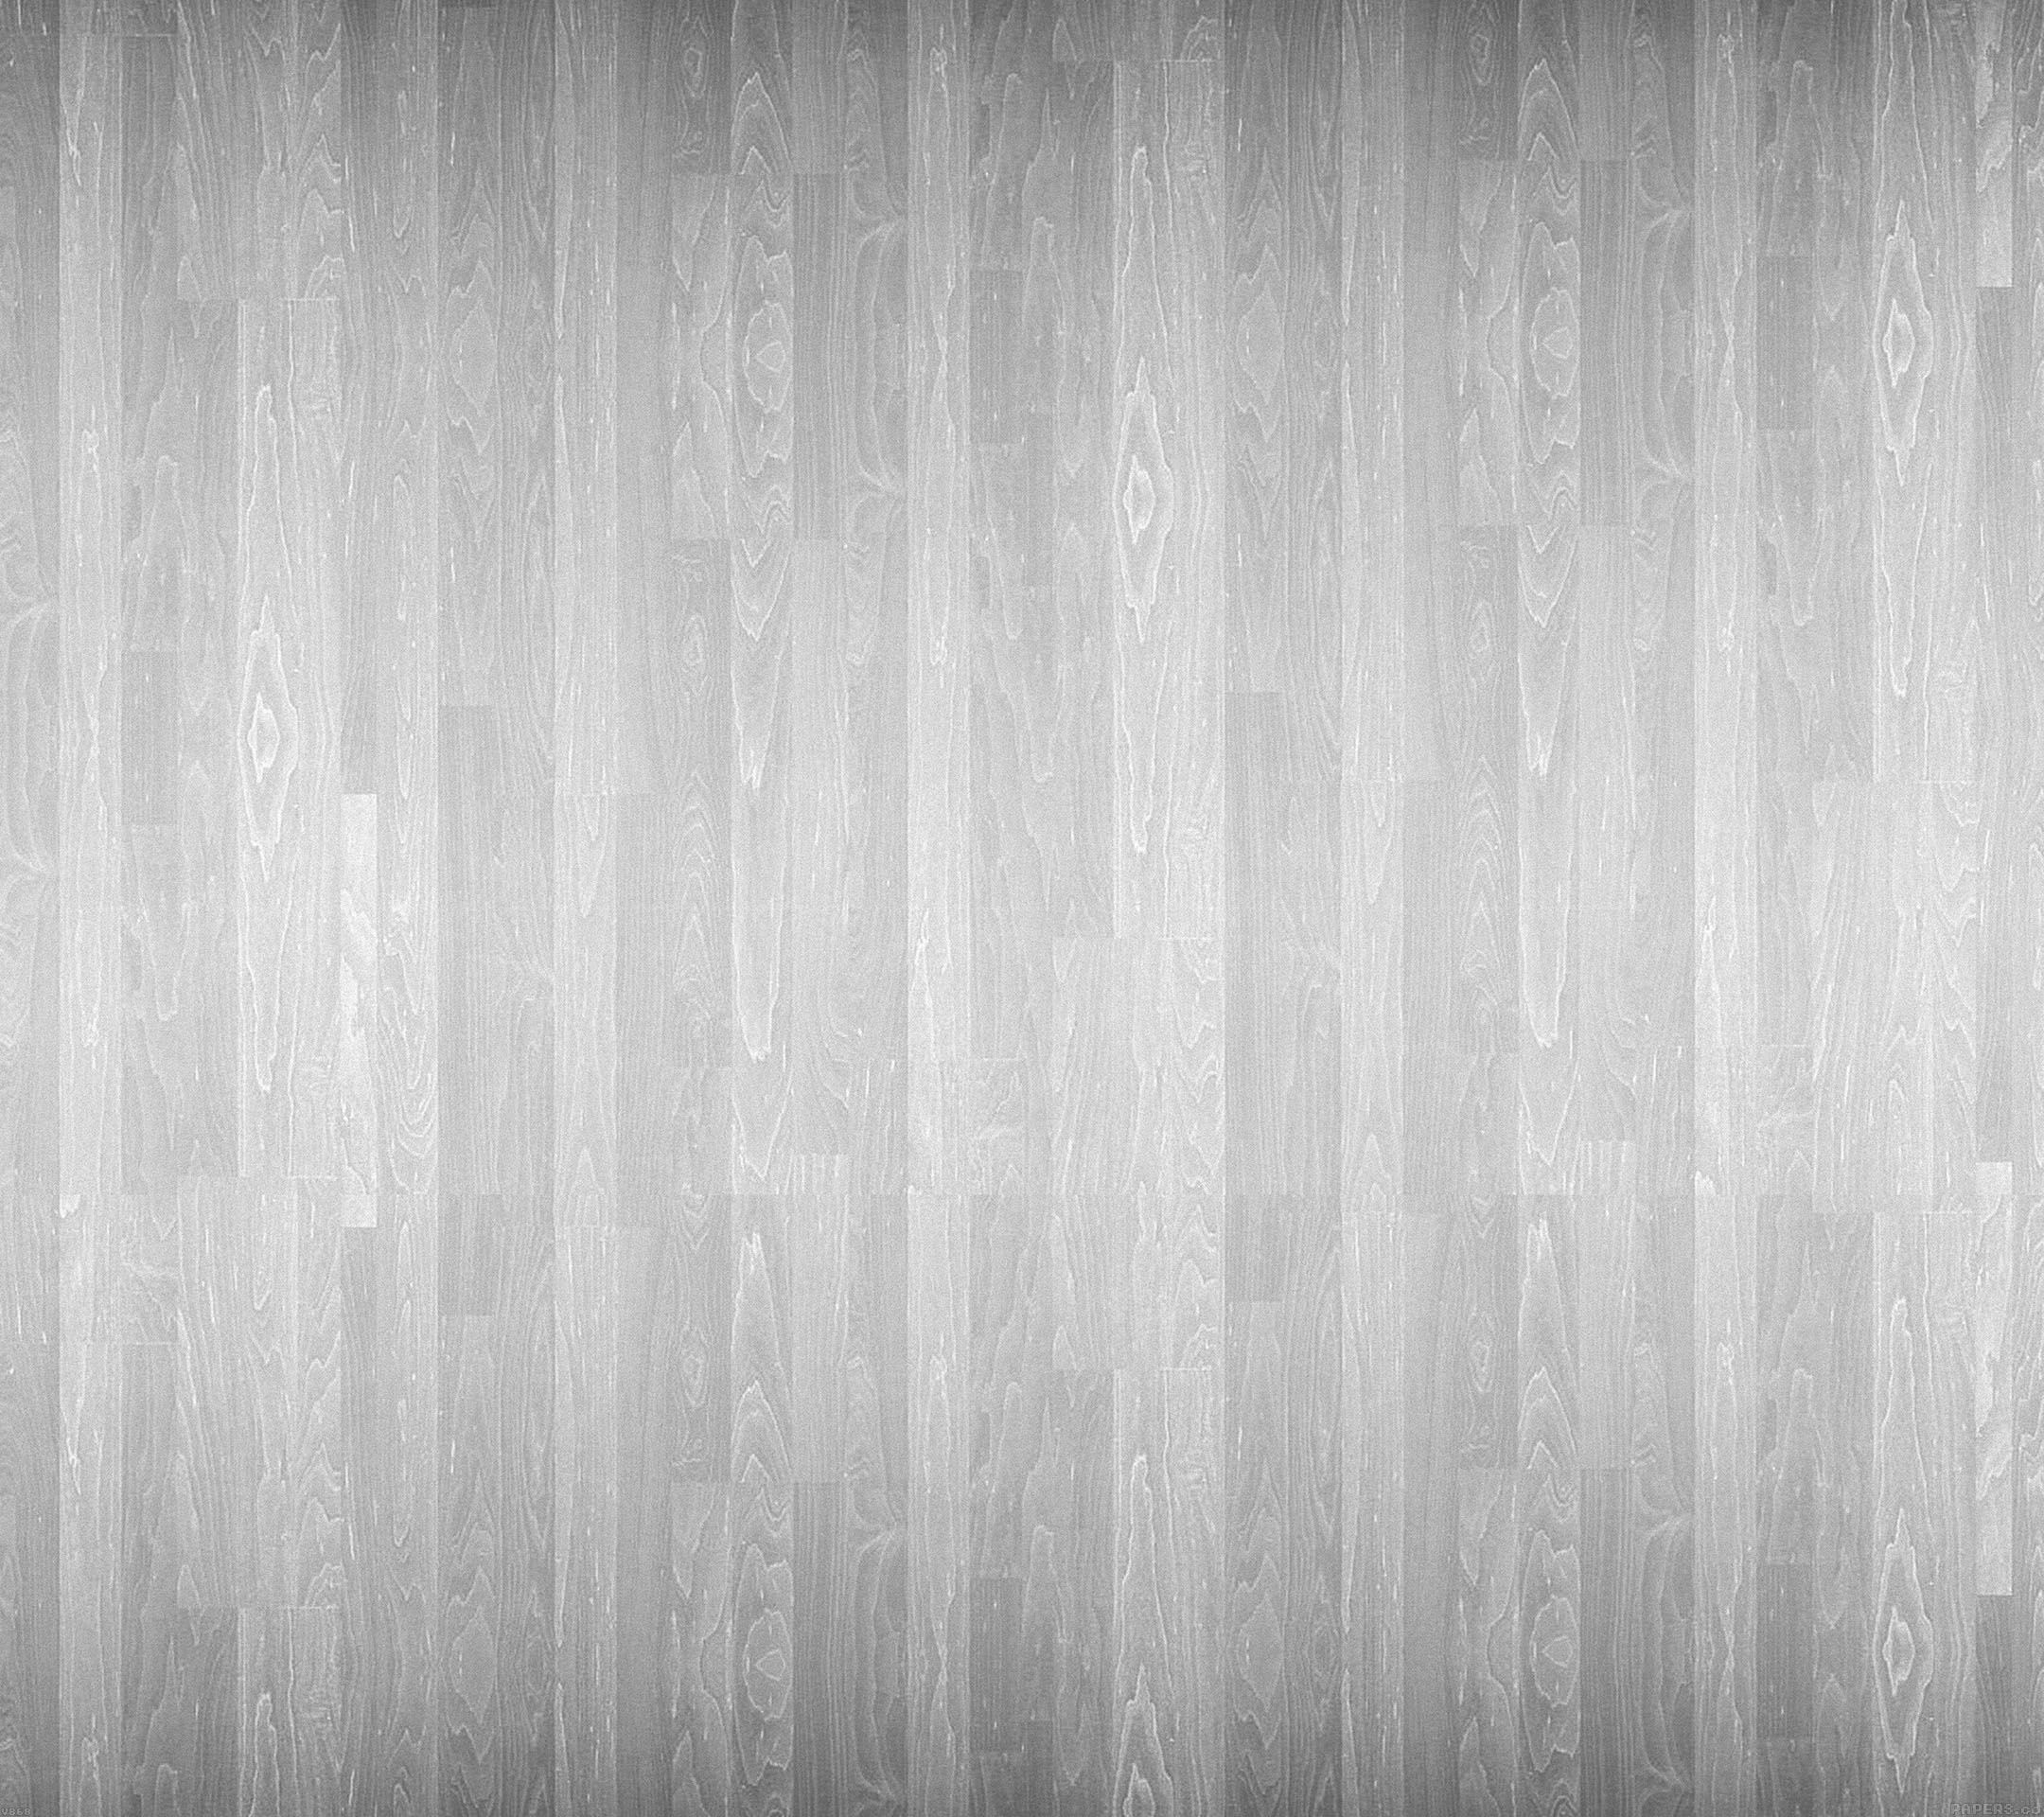 ipad air wallpaper size parallax